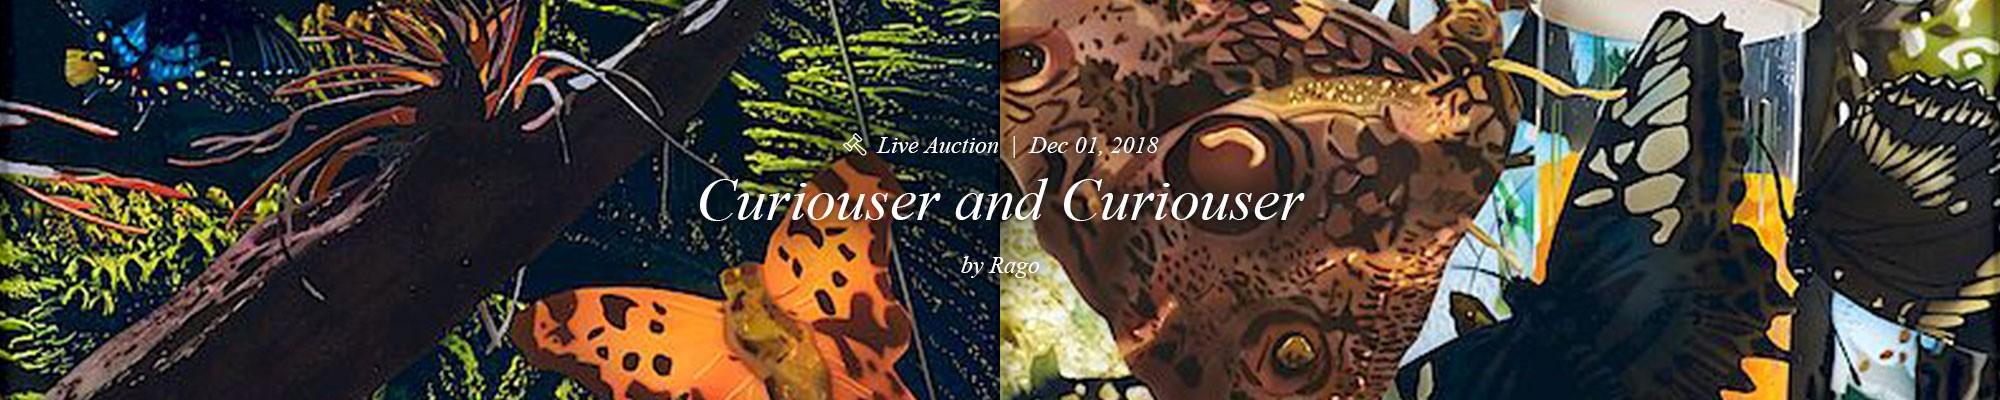 curiouser-and-curiouser-rago